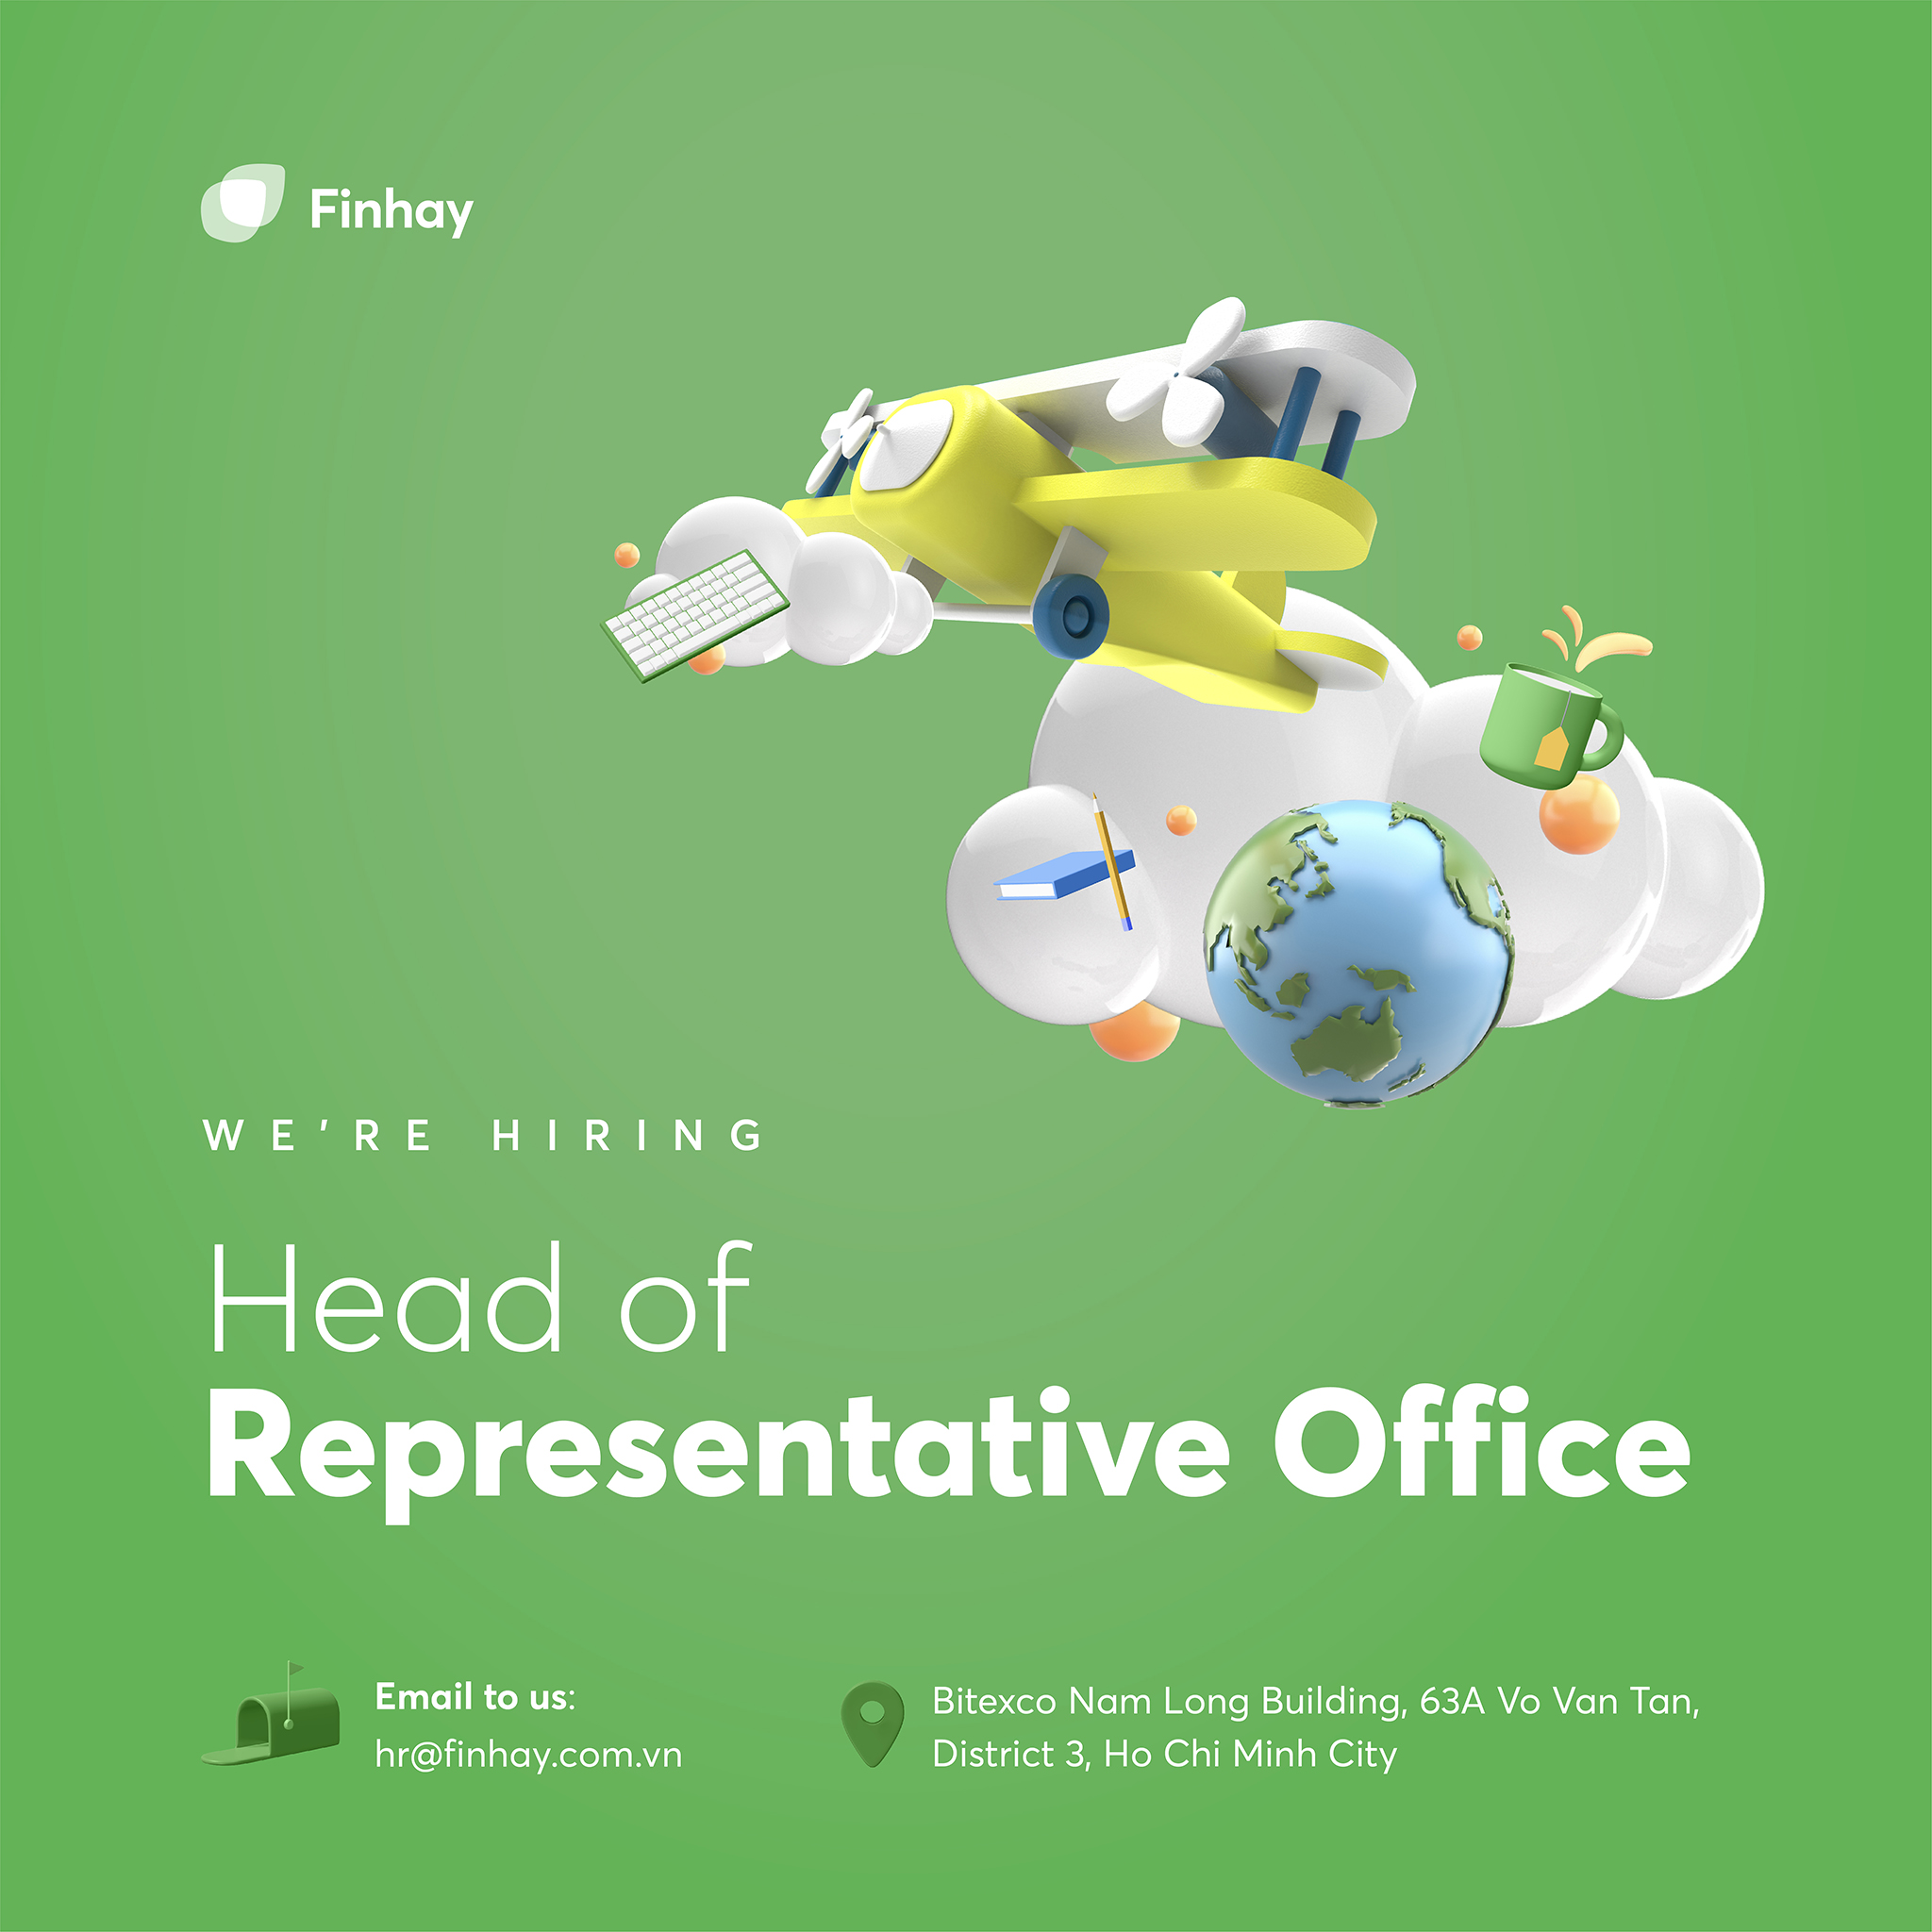 Head of Representative Office in HoChiMinh City